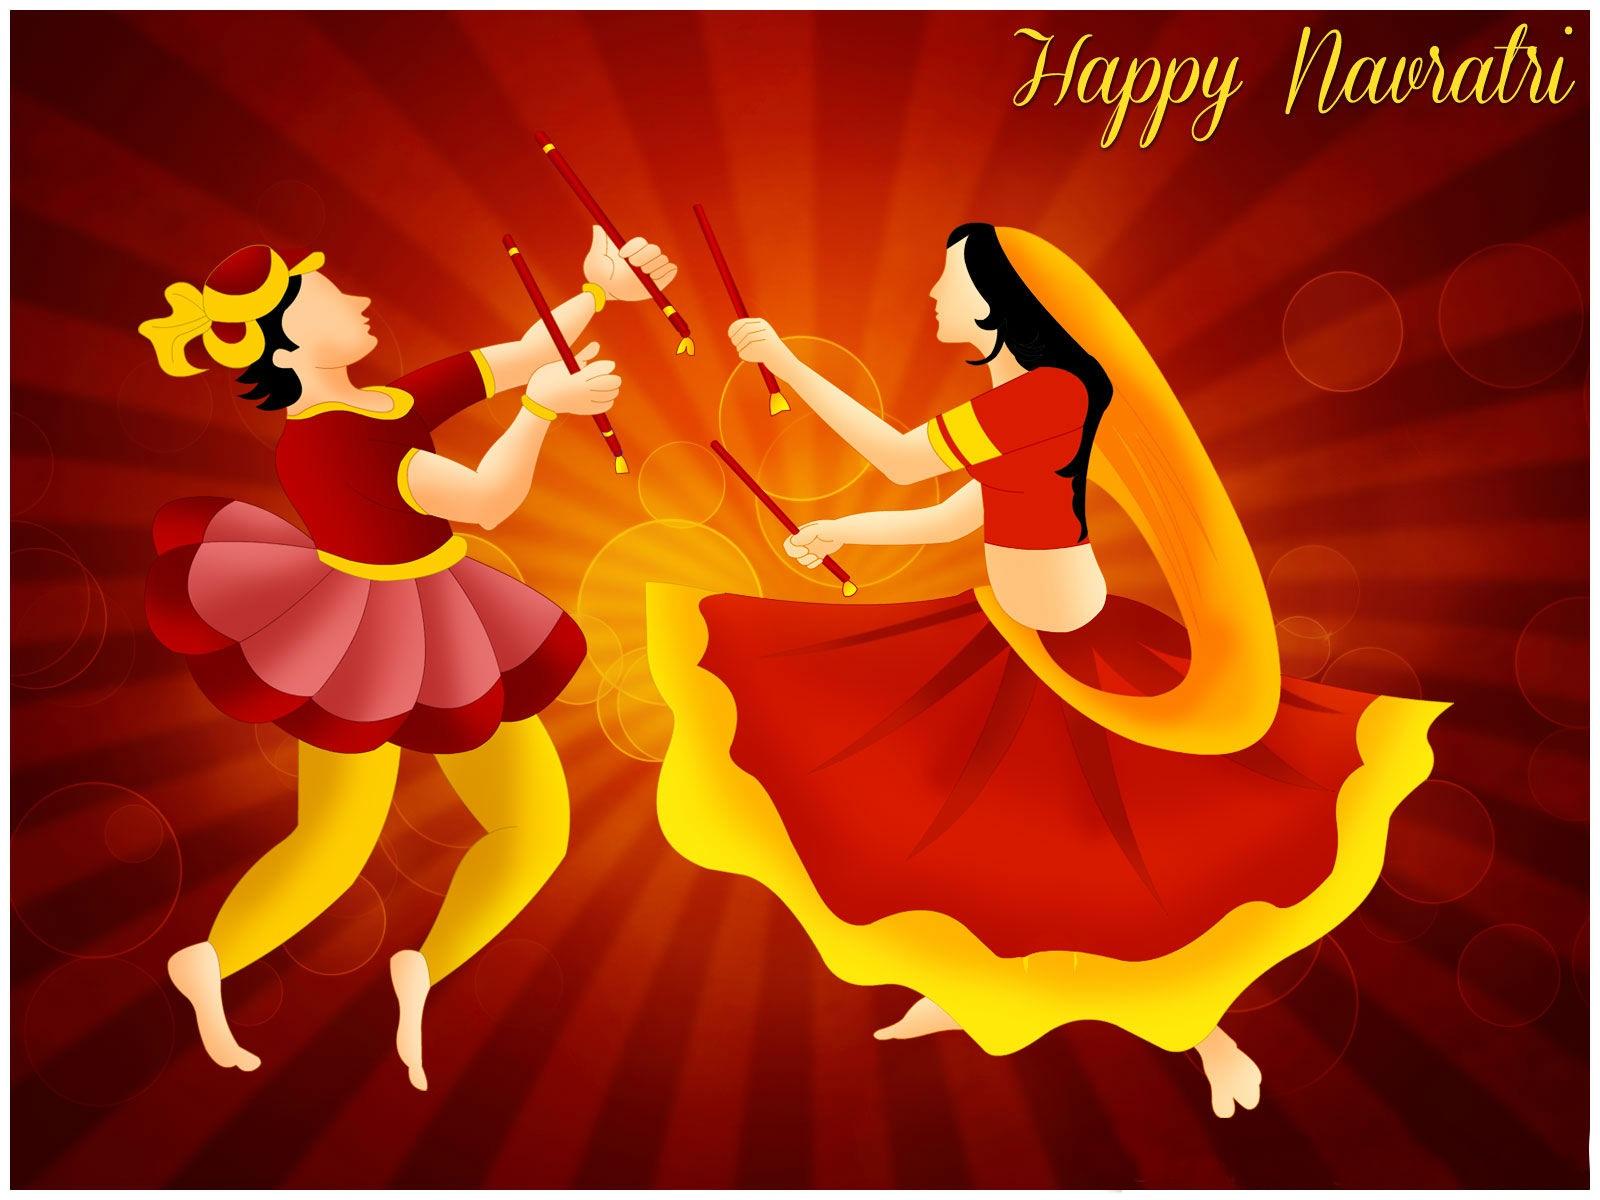 Happy Navratri Images HD